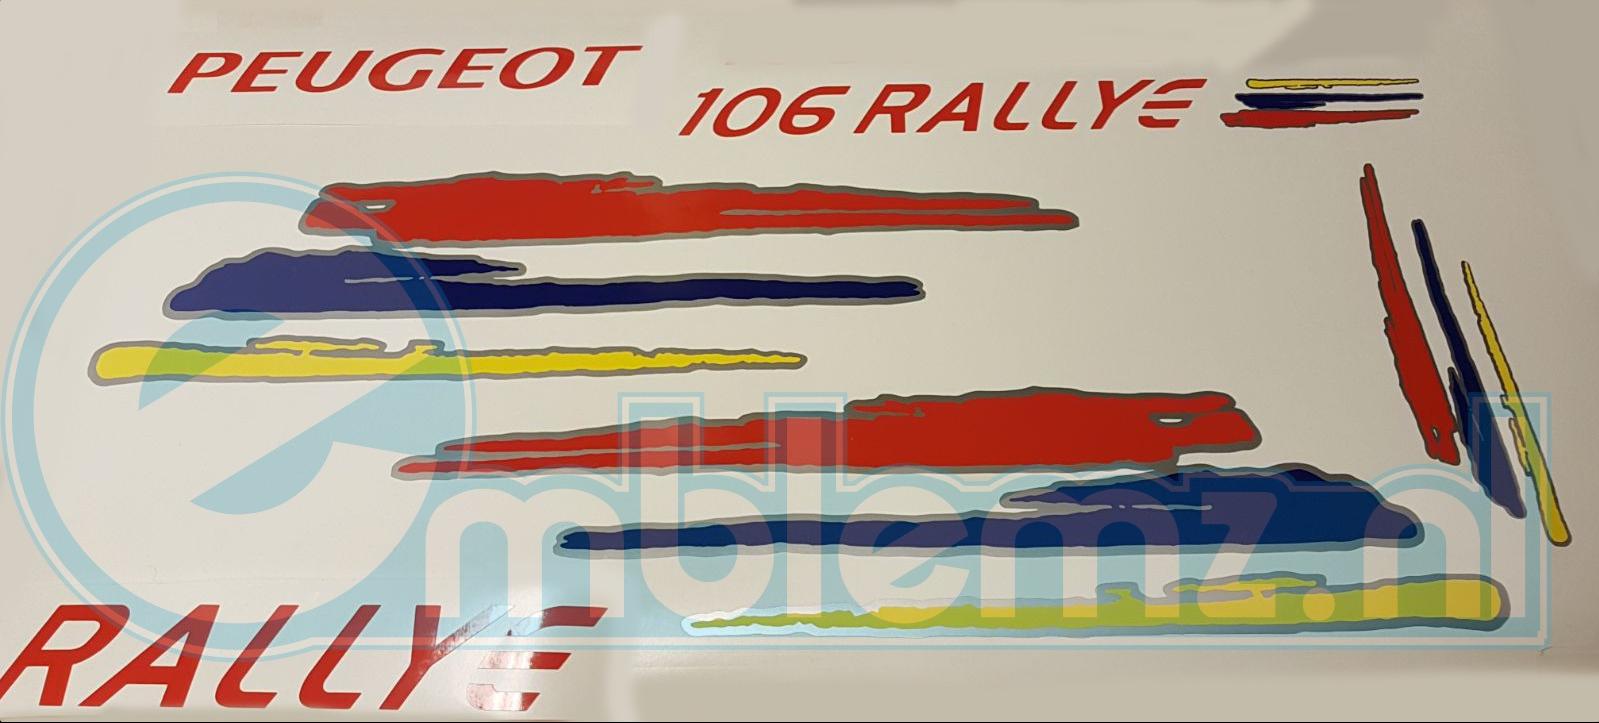 Peugeot 106/306 Rallye Graphics